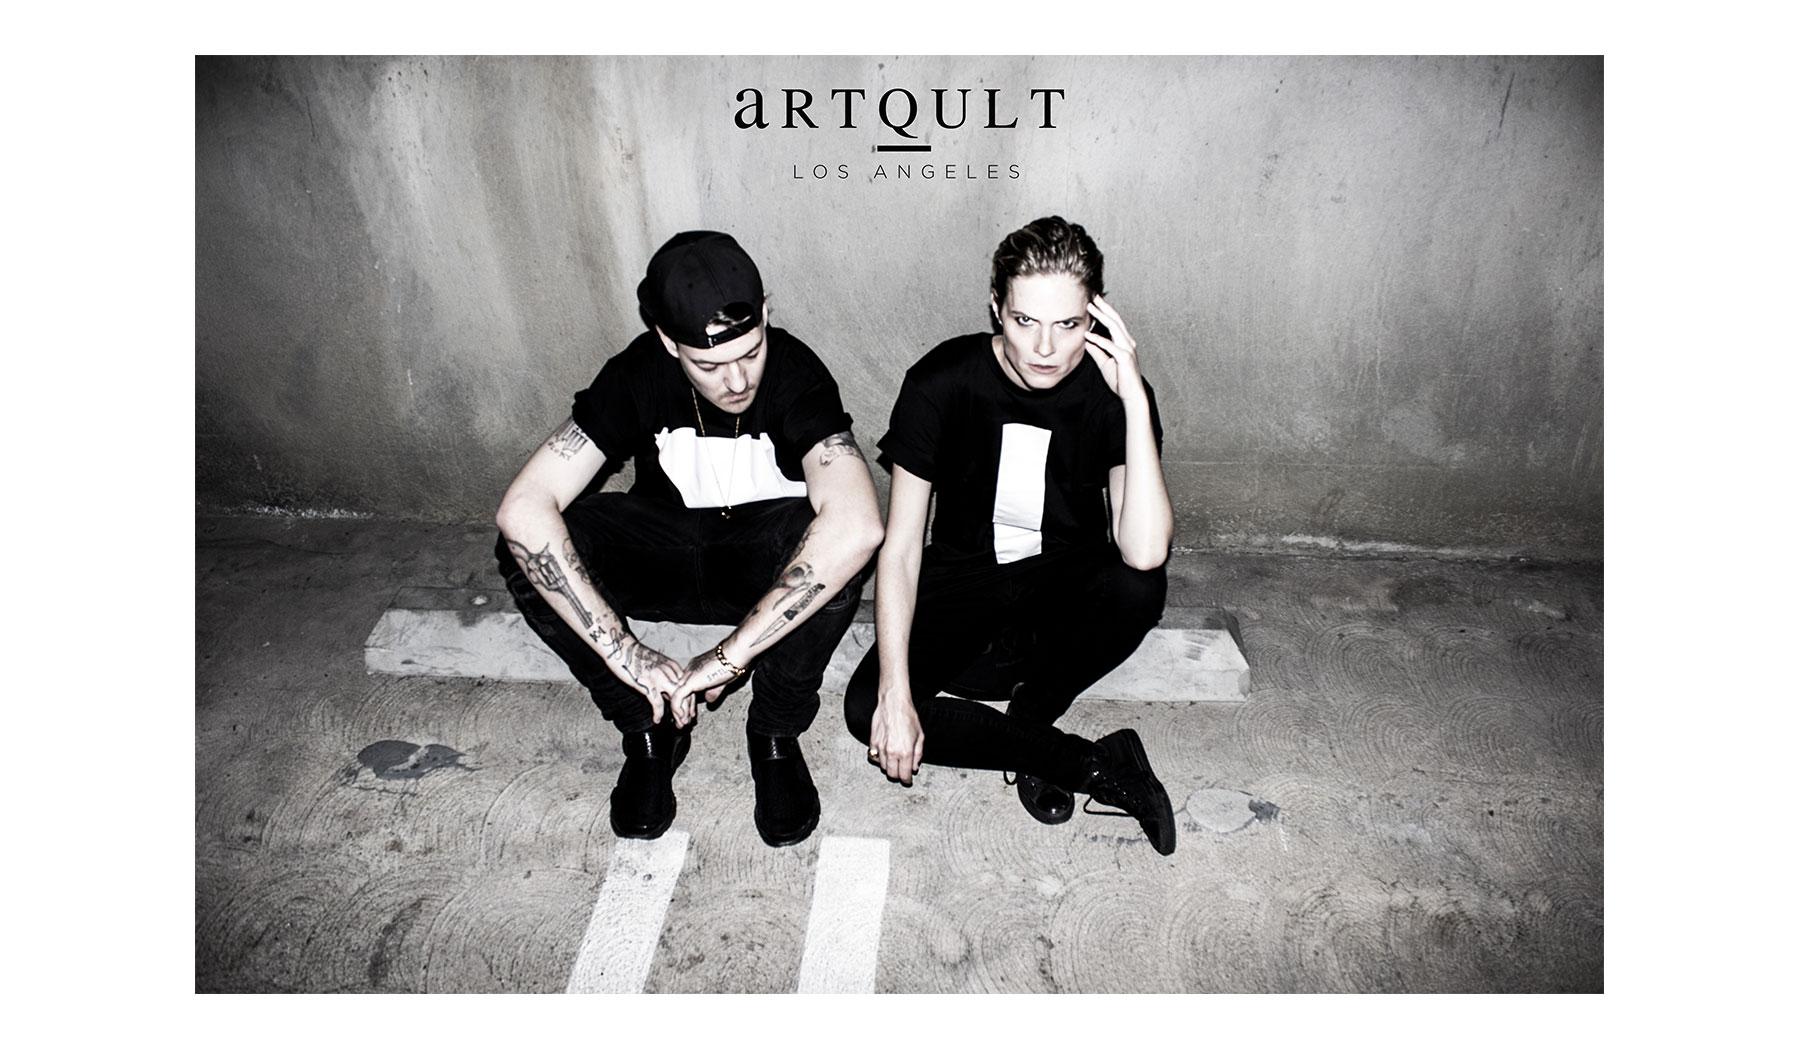 ARTQULT-LOS-ANGELES-LOOKBOOK-12.jpg